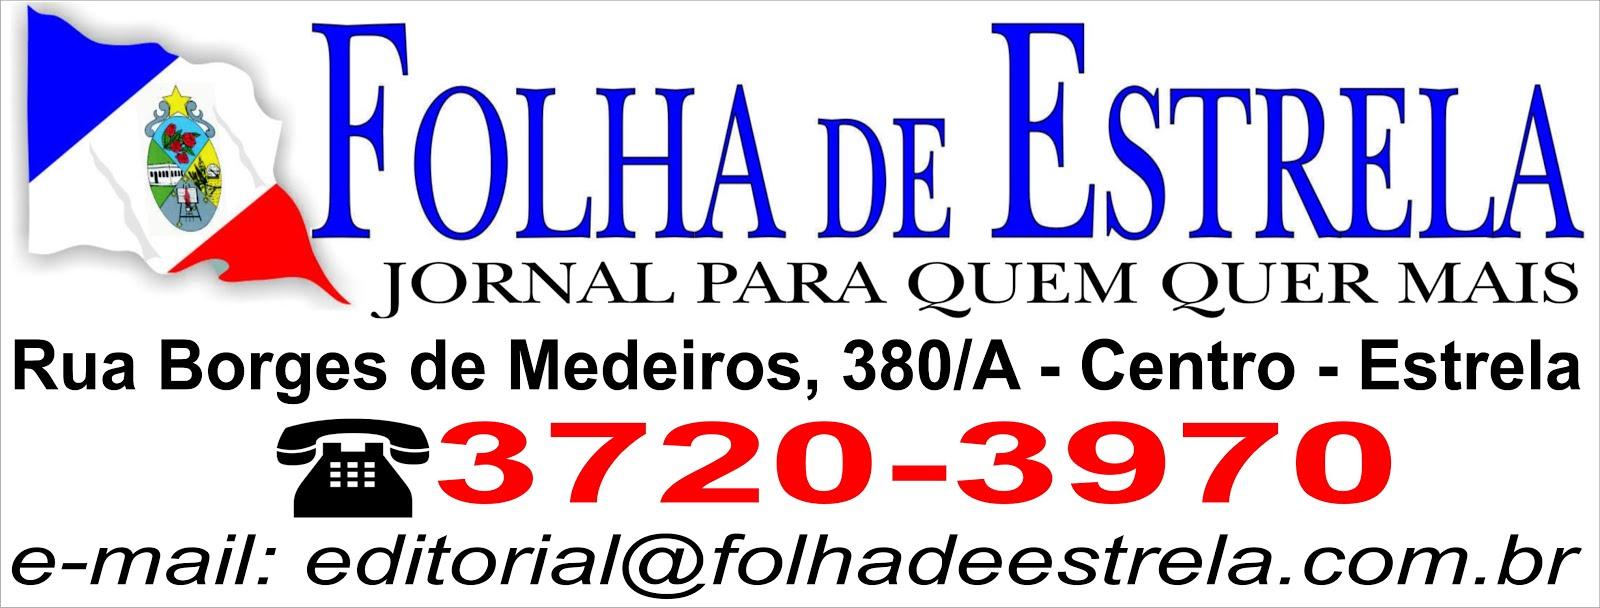 JORNAL FOLHA DE ESTRELA - 3720-2970